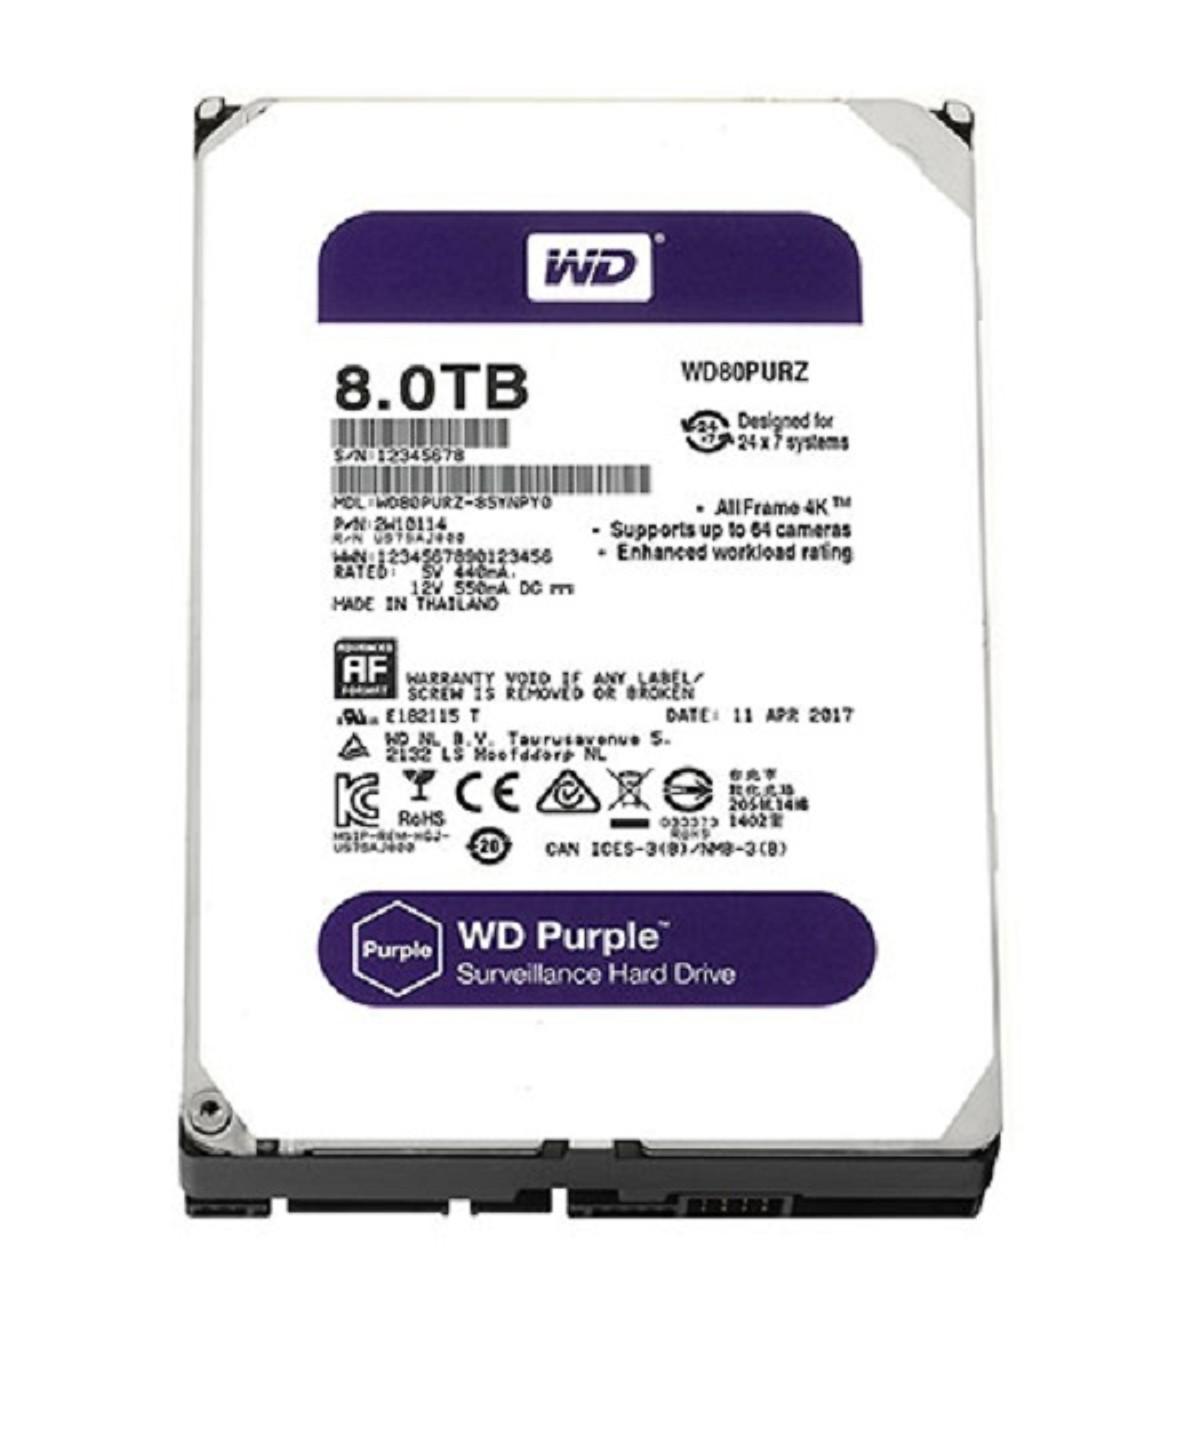 Ổ Cứng HDD Western Digital Purple 8TB 3.5 inch Sata 3 - Hàng Nhập Khẩu